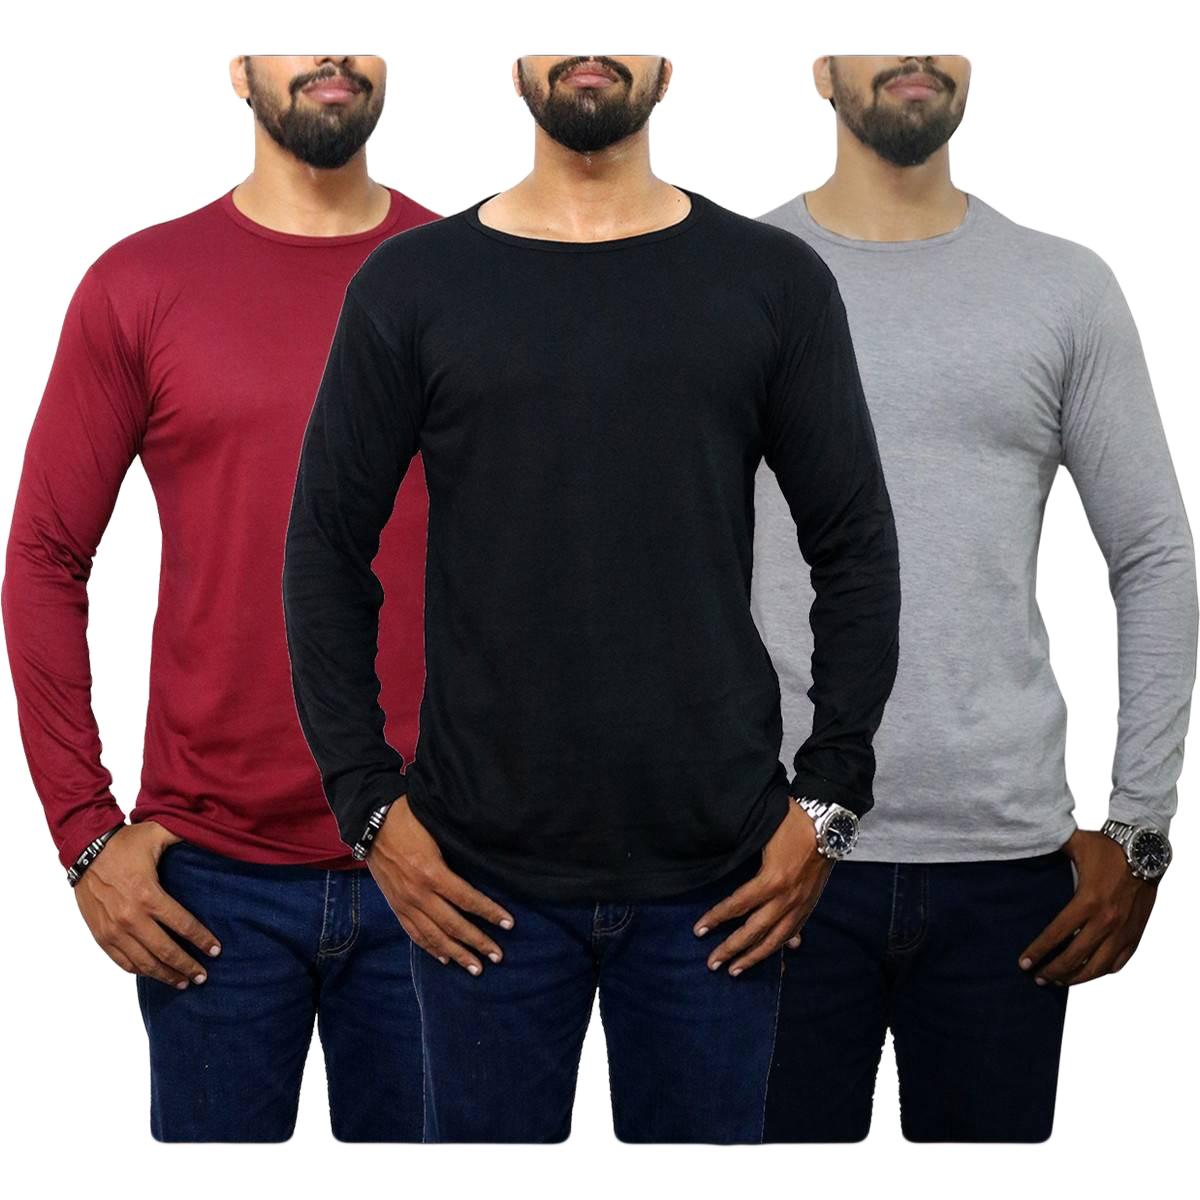 Pack Of 3 O-Neck full Sleeves Black Maroon Gray T Shirts for Men